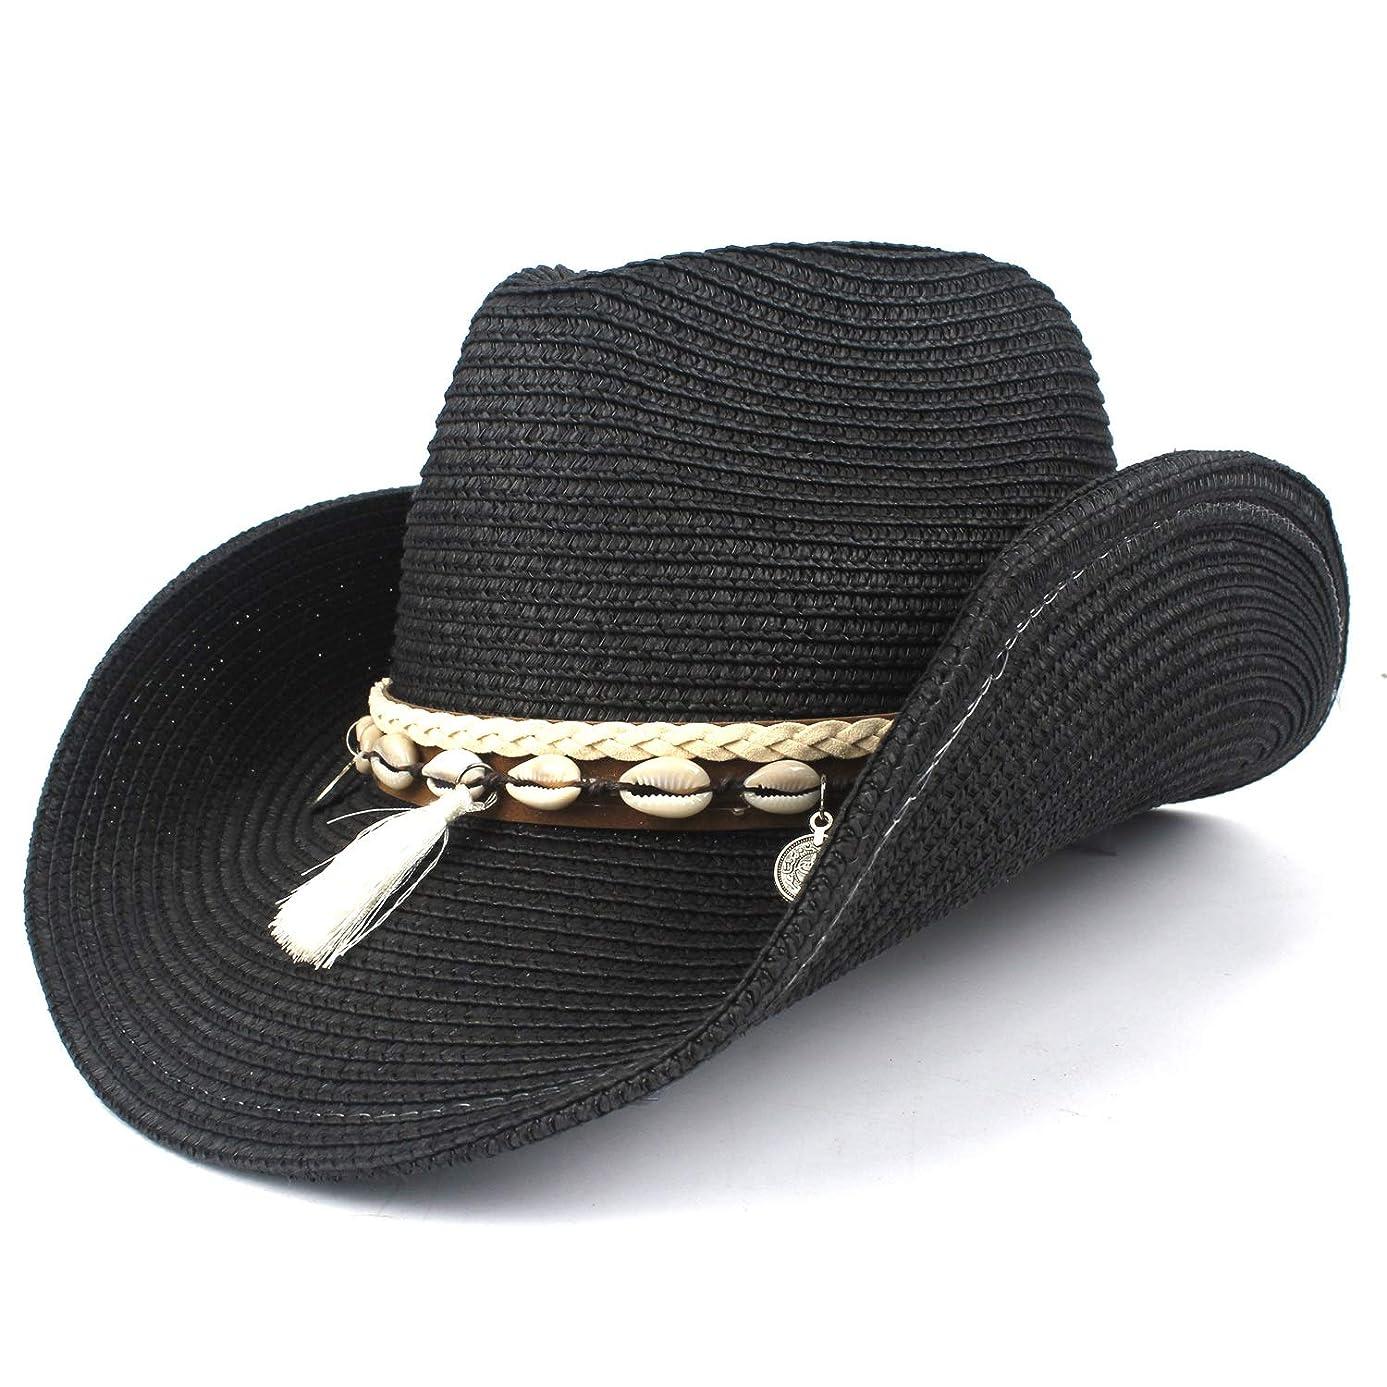 VAXT Direct Women Husk Westerly Cowboy Hat Summer Elegant Lady Cowgirl Sombrero Sun Hats with Tassel Band Jazz Hat